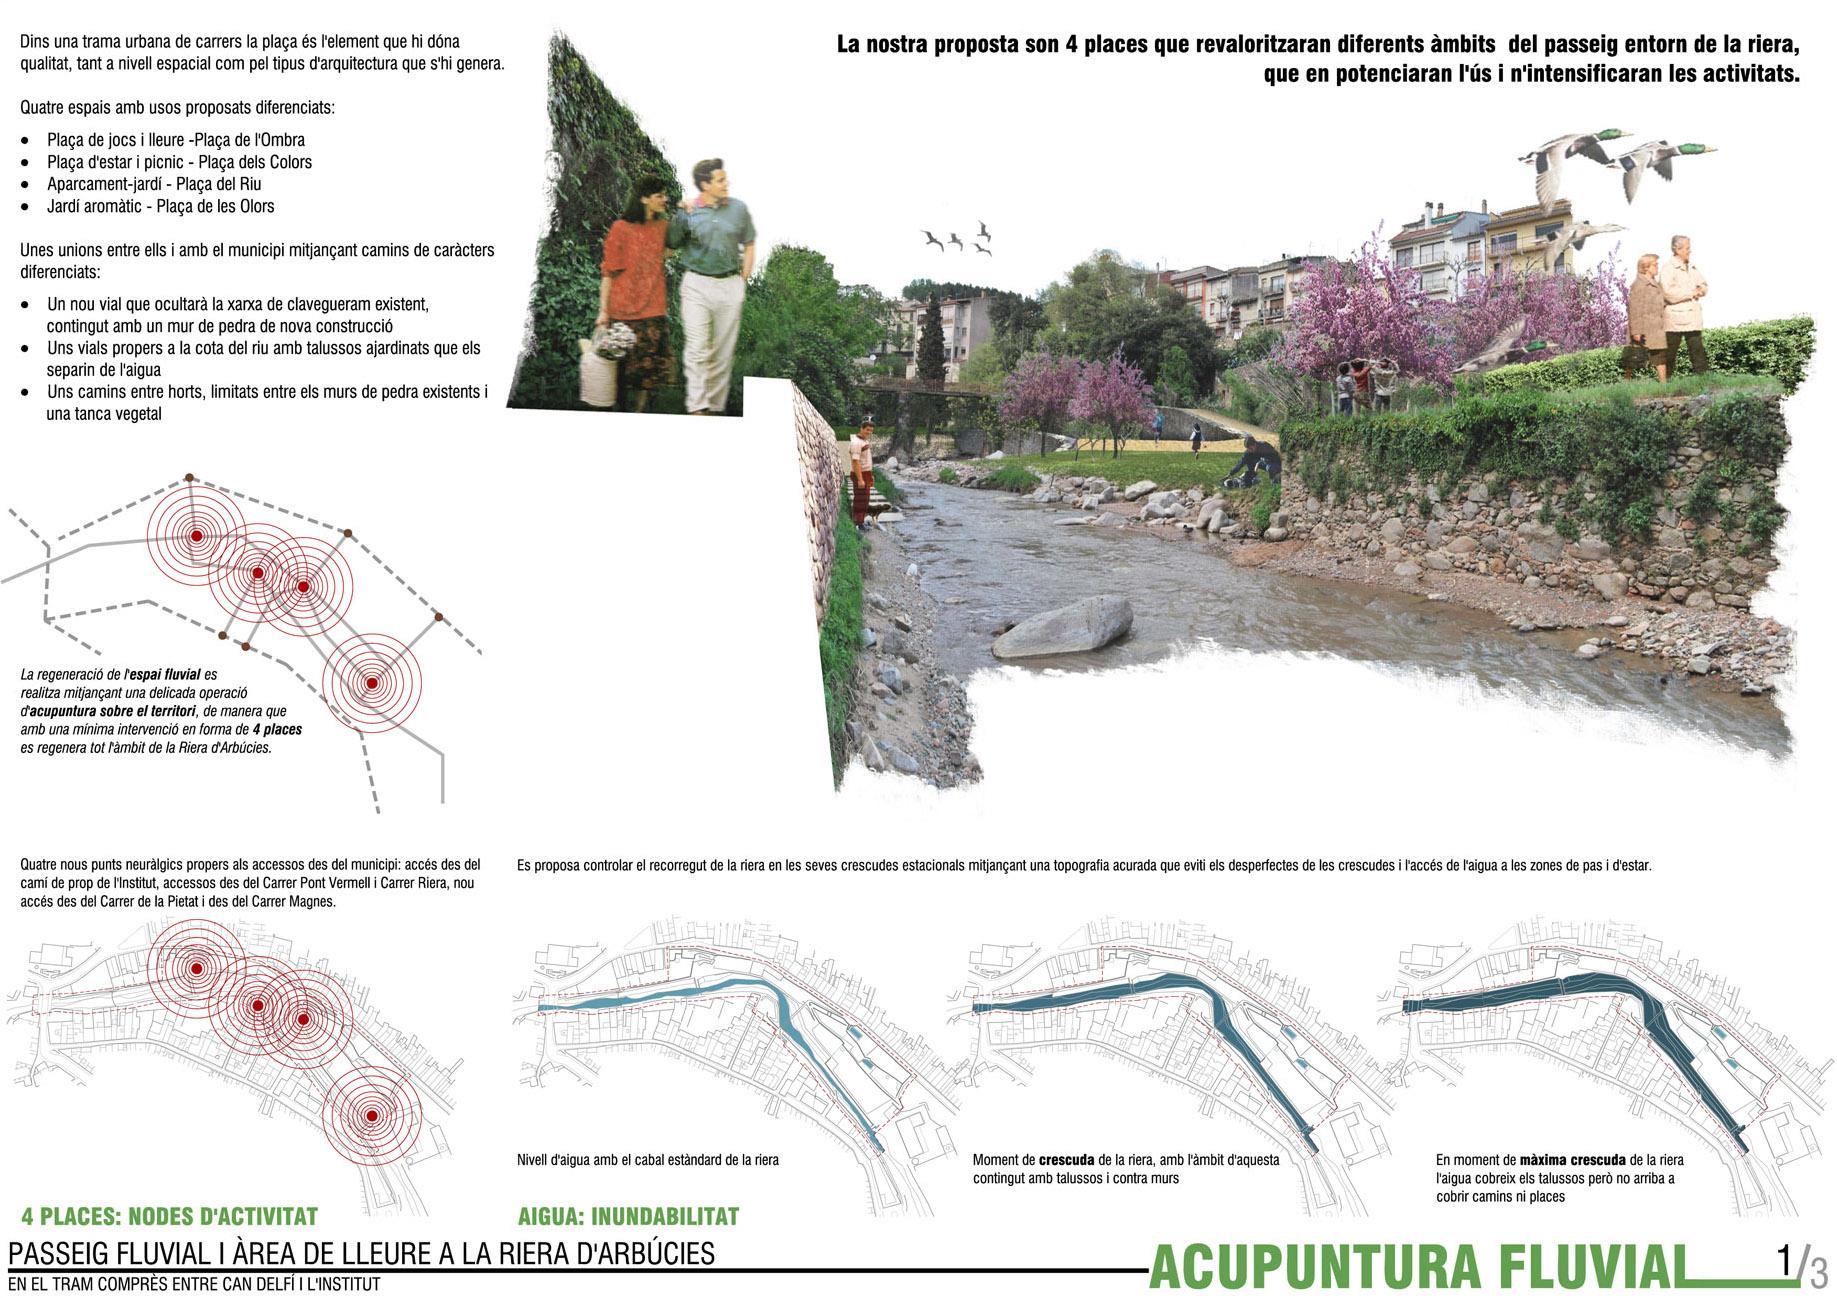 GI001_ACUPUNTURA_FLUVIAL_P01-2